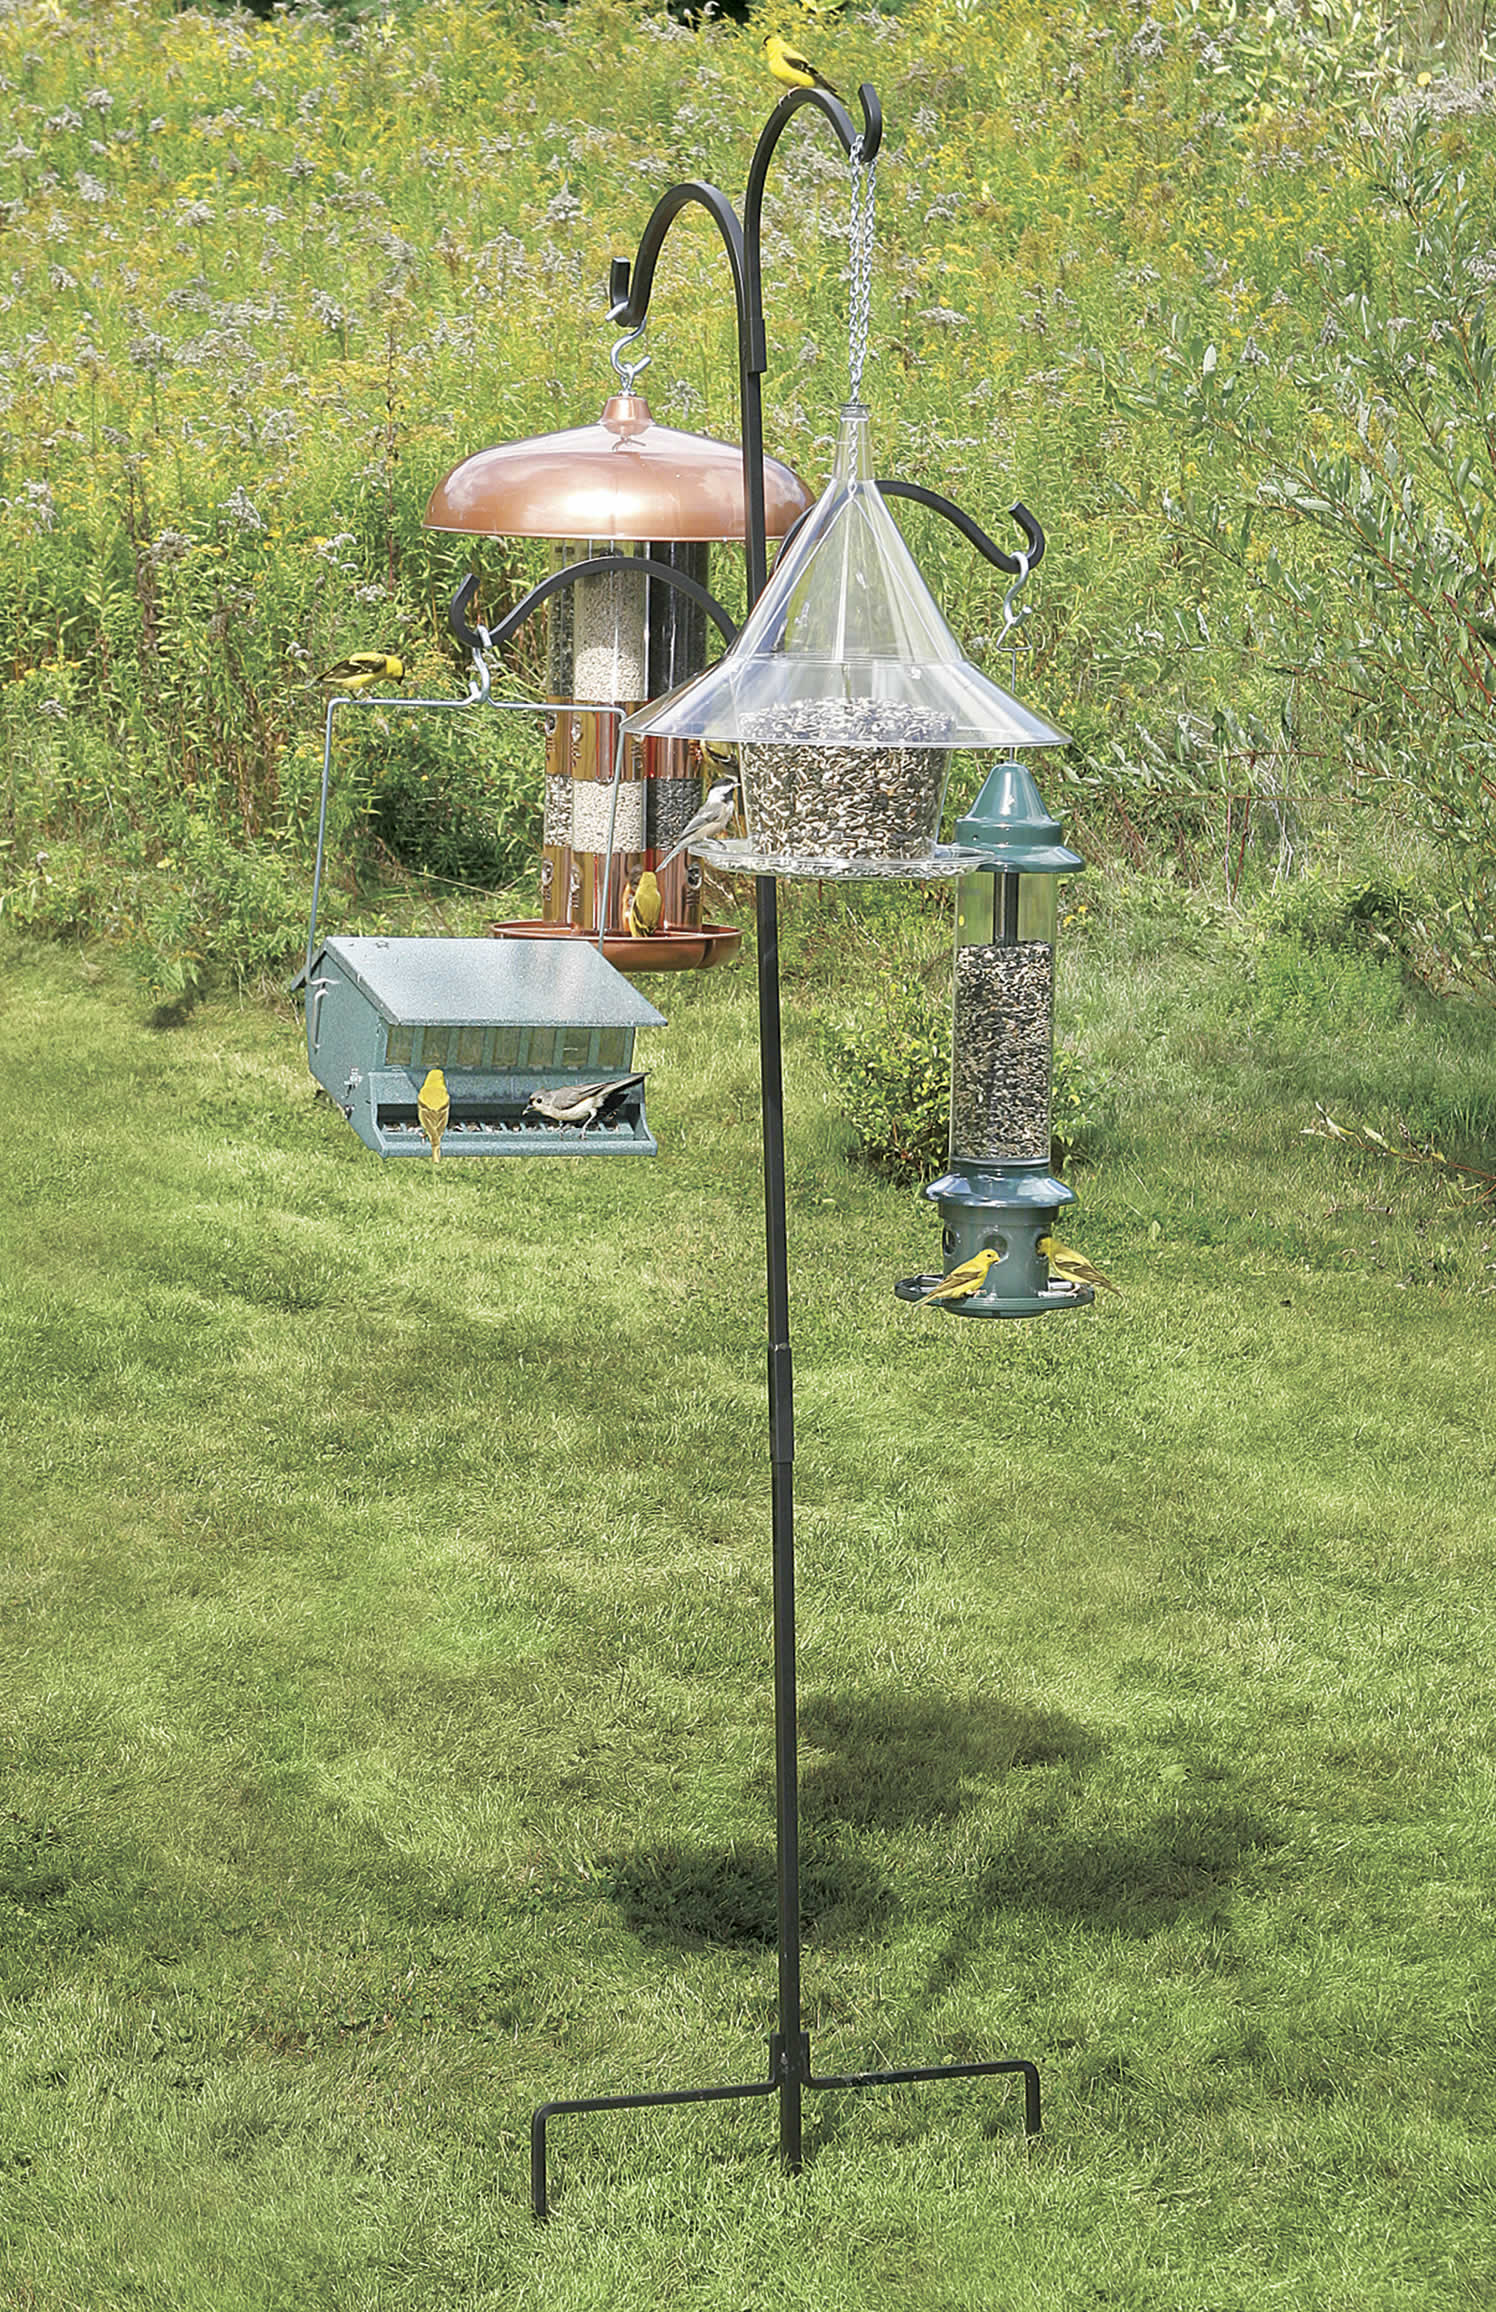 black amazon hangers dp bird outdoor feeder mounted accessories deck select reach garden com stokes metal decks for inch wild pole